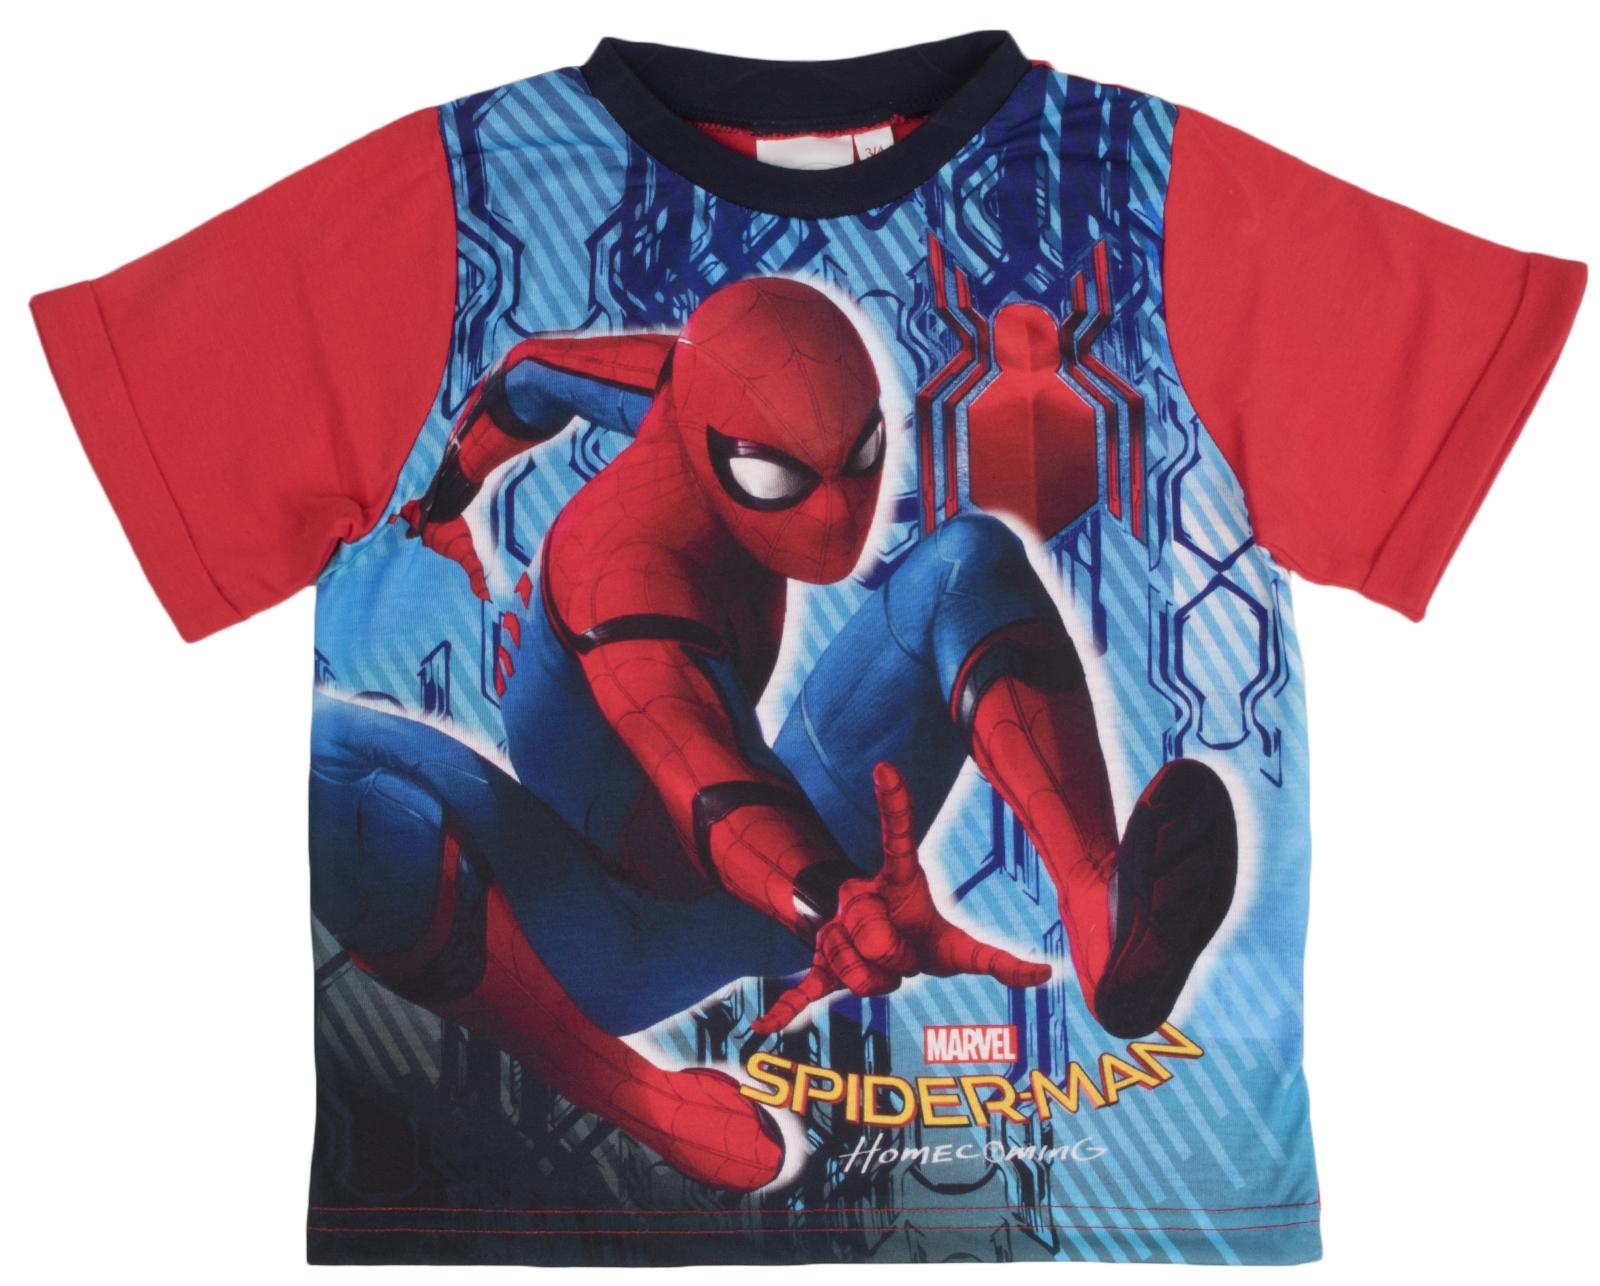 Ragazzi Ragazze Pigiama Spiderman corto PJs Pigiama estivo Set supereroe Bambino Taglia